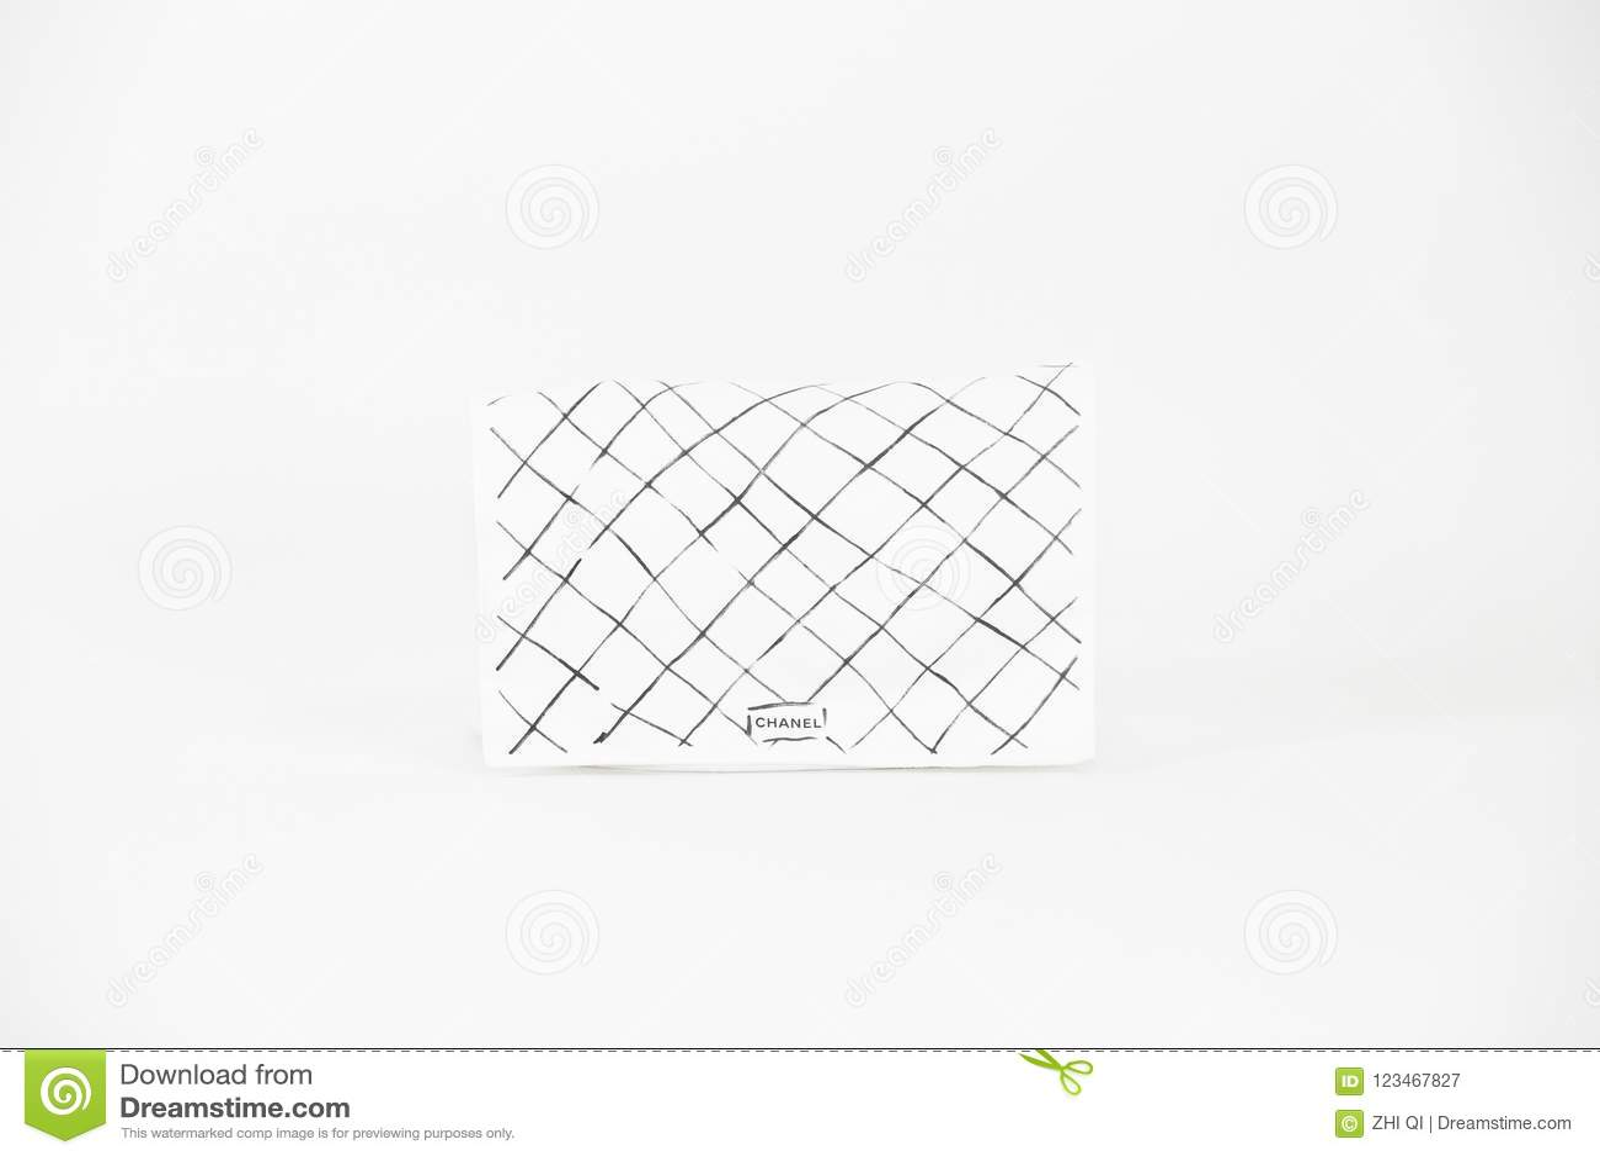 8cc362a4a9a4 Photo Of Black Chanel Handbag Brand Editorial On White Background ...